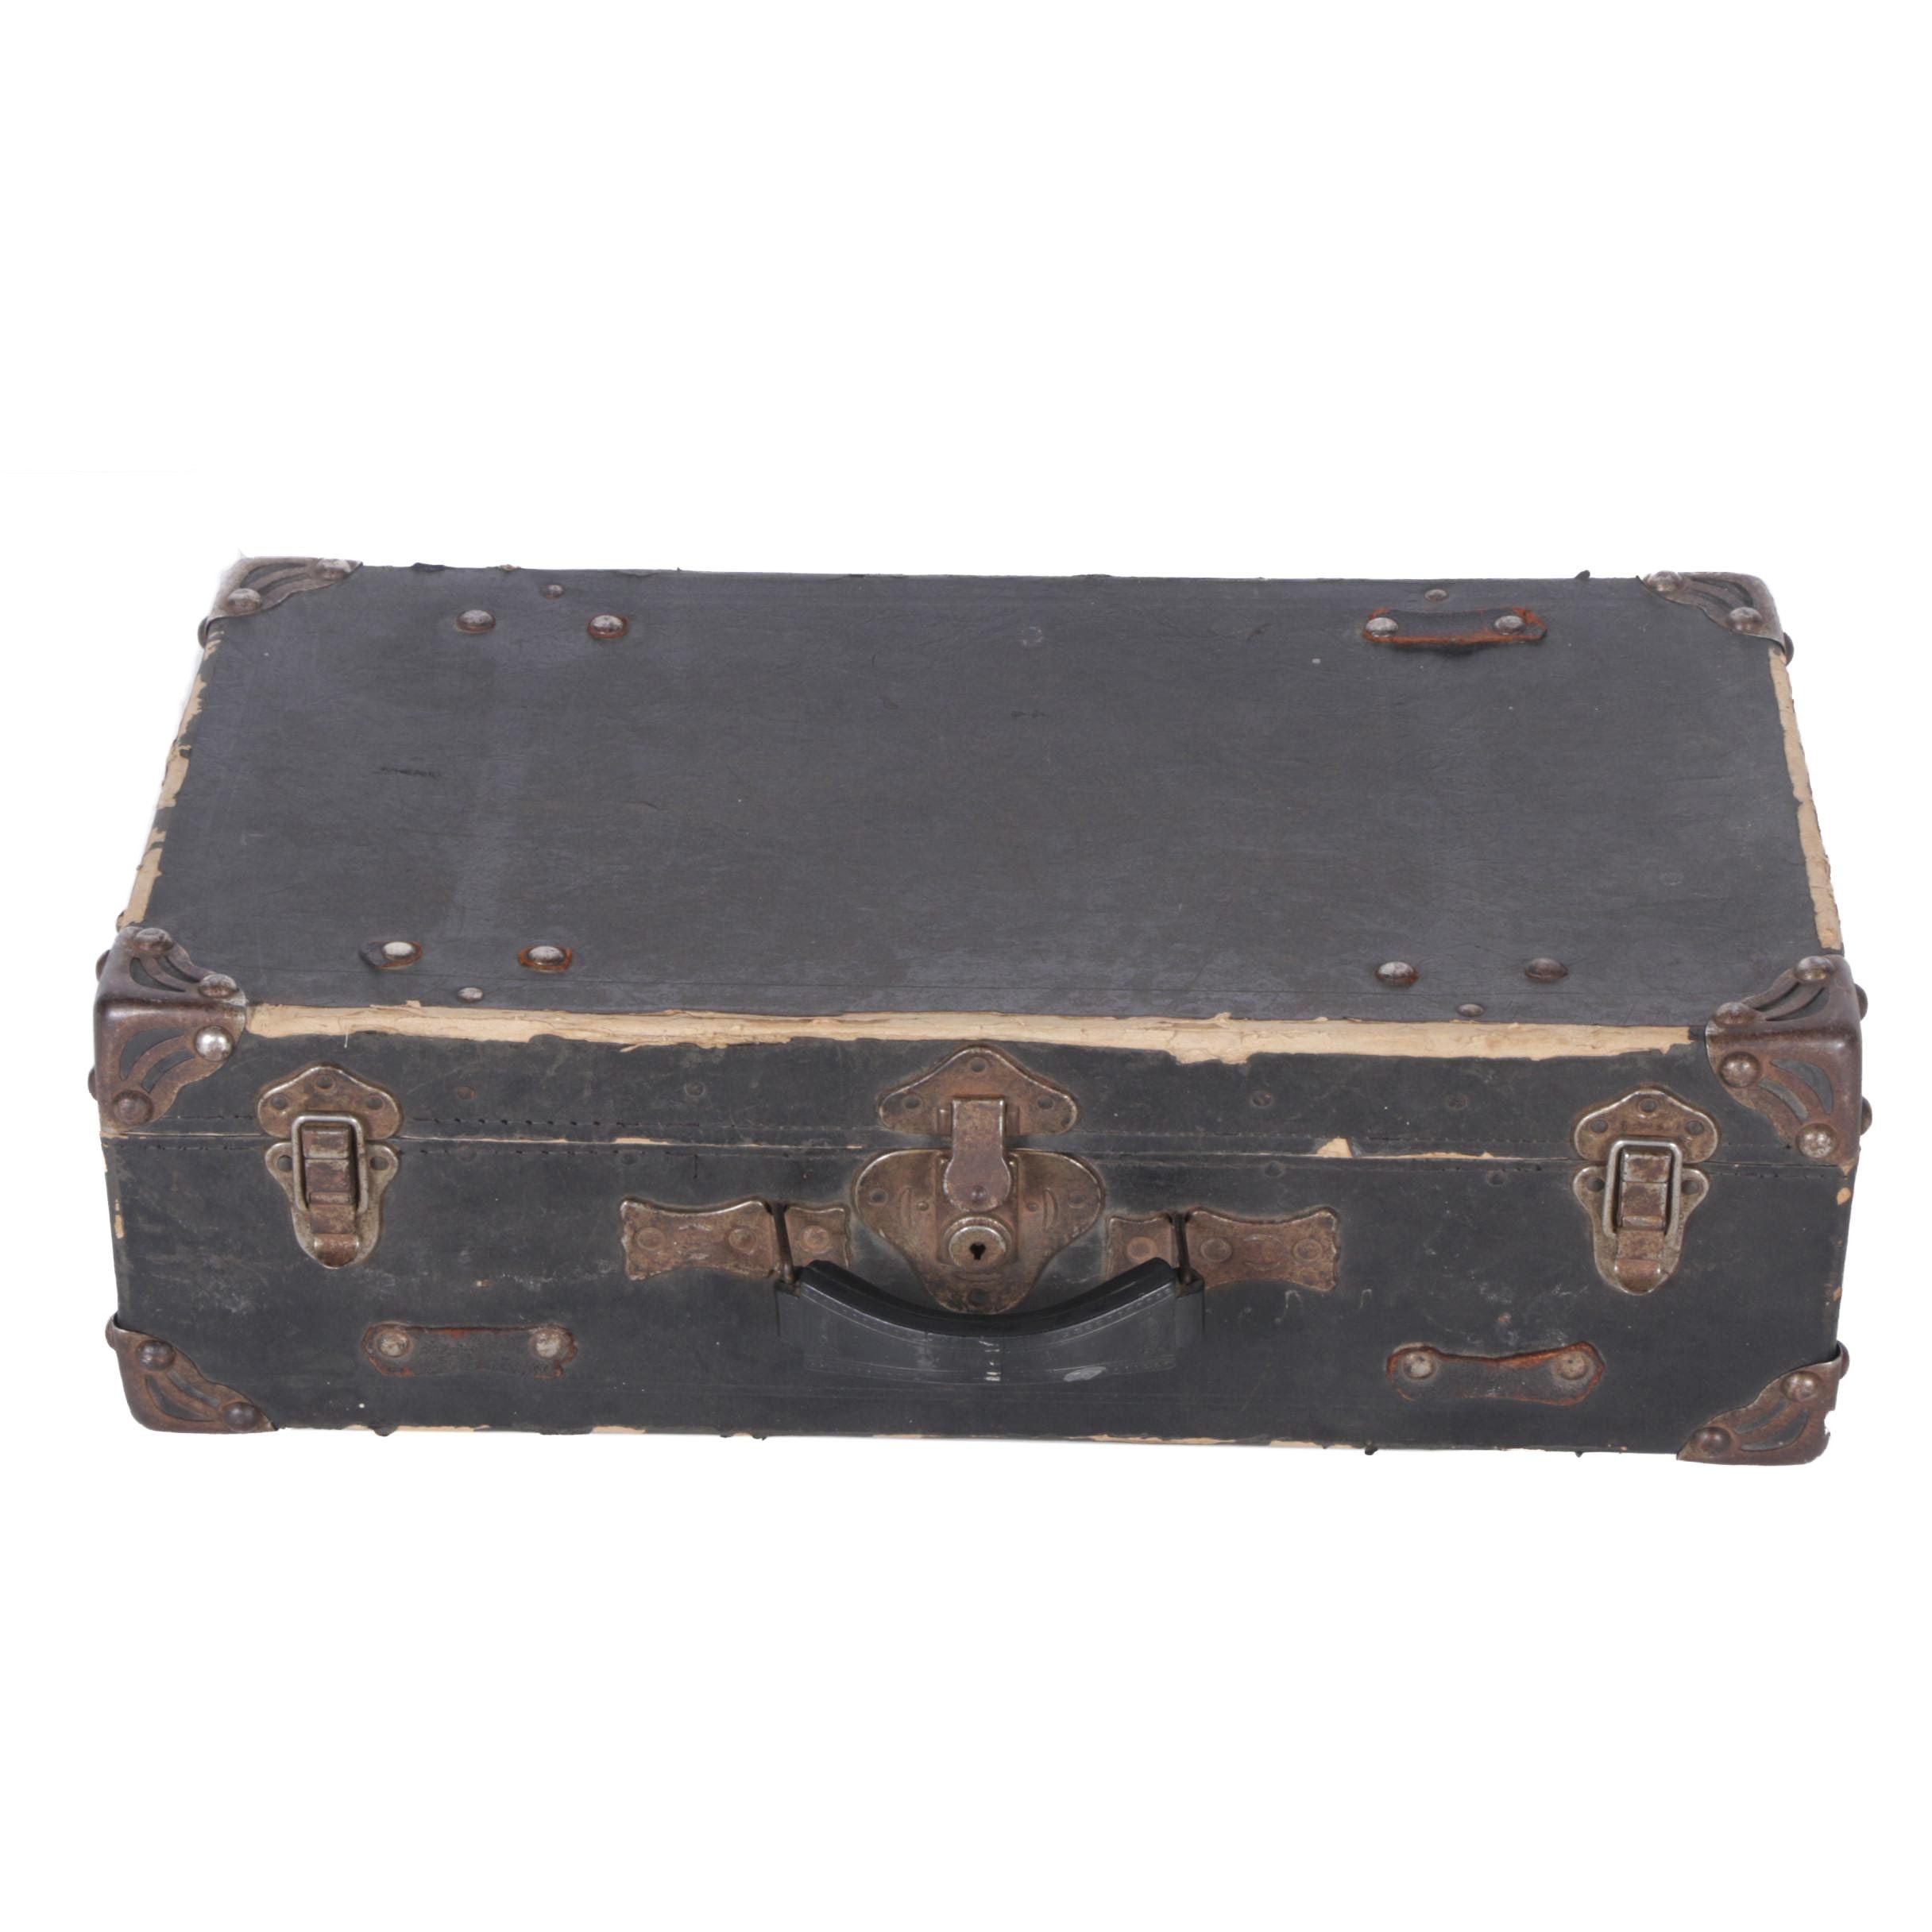 "Vintage ""Samson"" Luggage Trunk by Shwayder Trunk Mfg. Co."